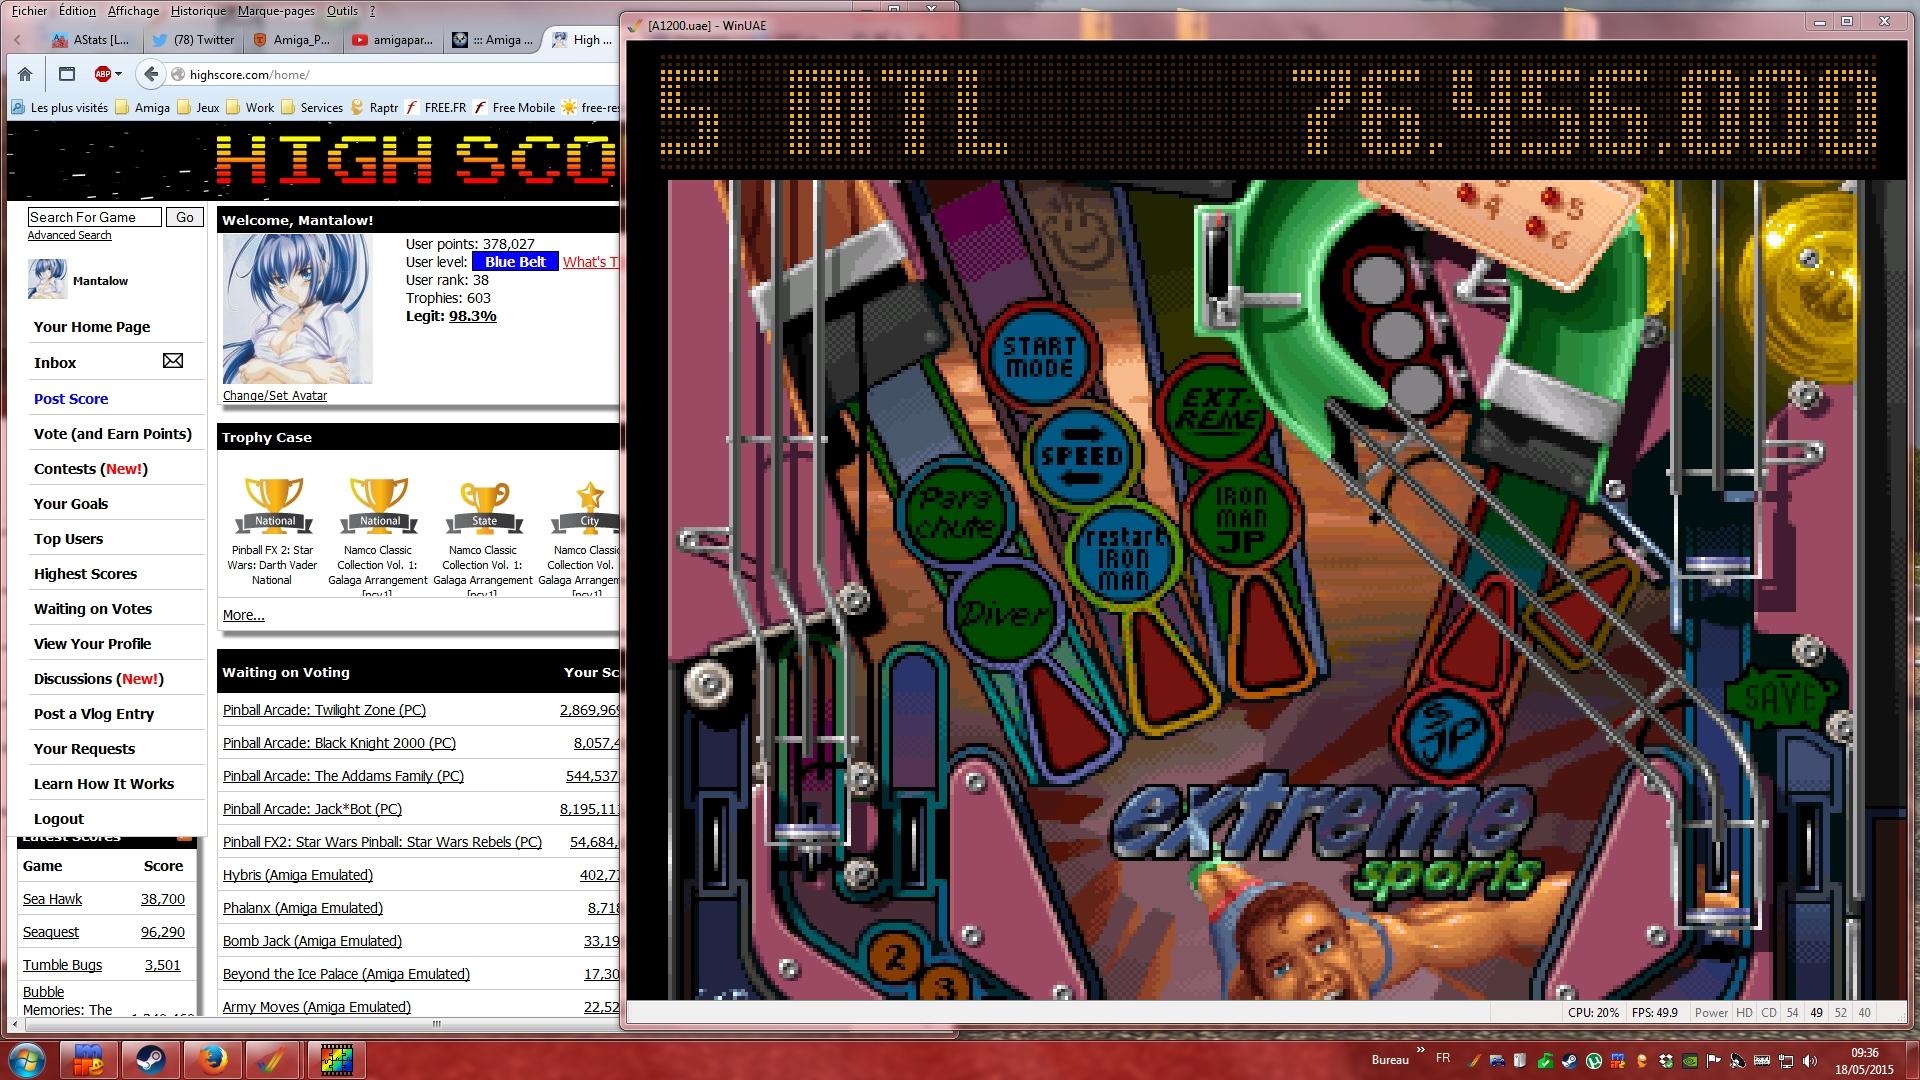 Mantalow: Pinball Illusions: Extreme Sports (Amiga Emulated) 76,456,000 points on 2015-05-18 02:39:33